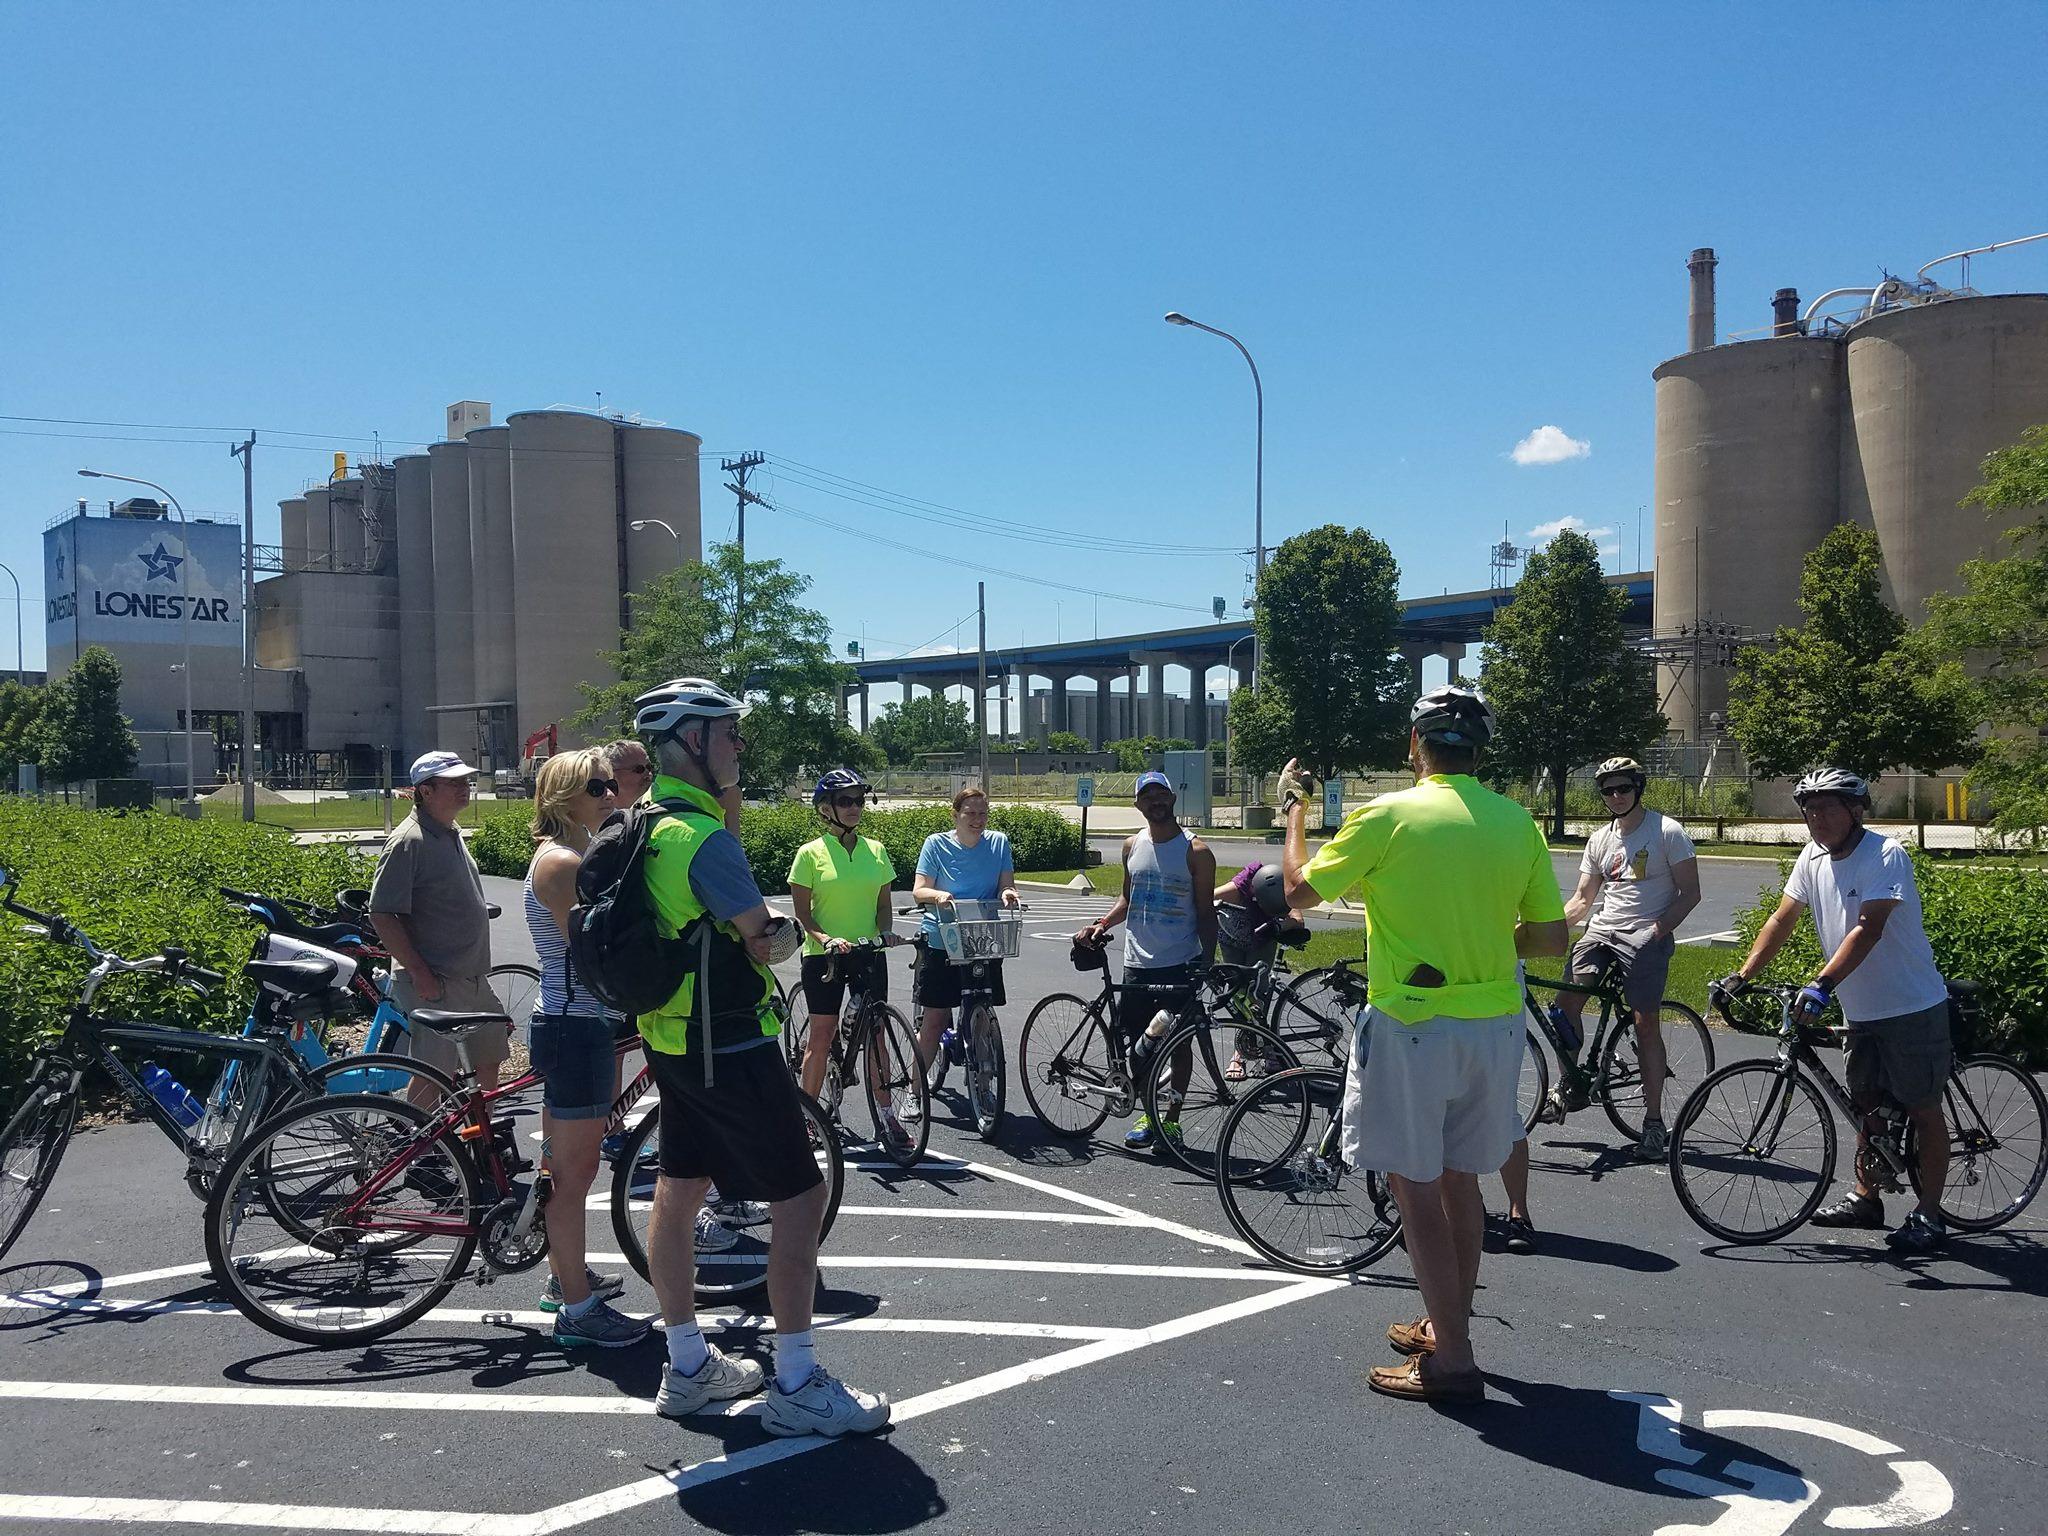 Menomonee River Valley Bike Tour